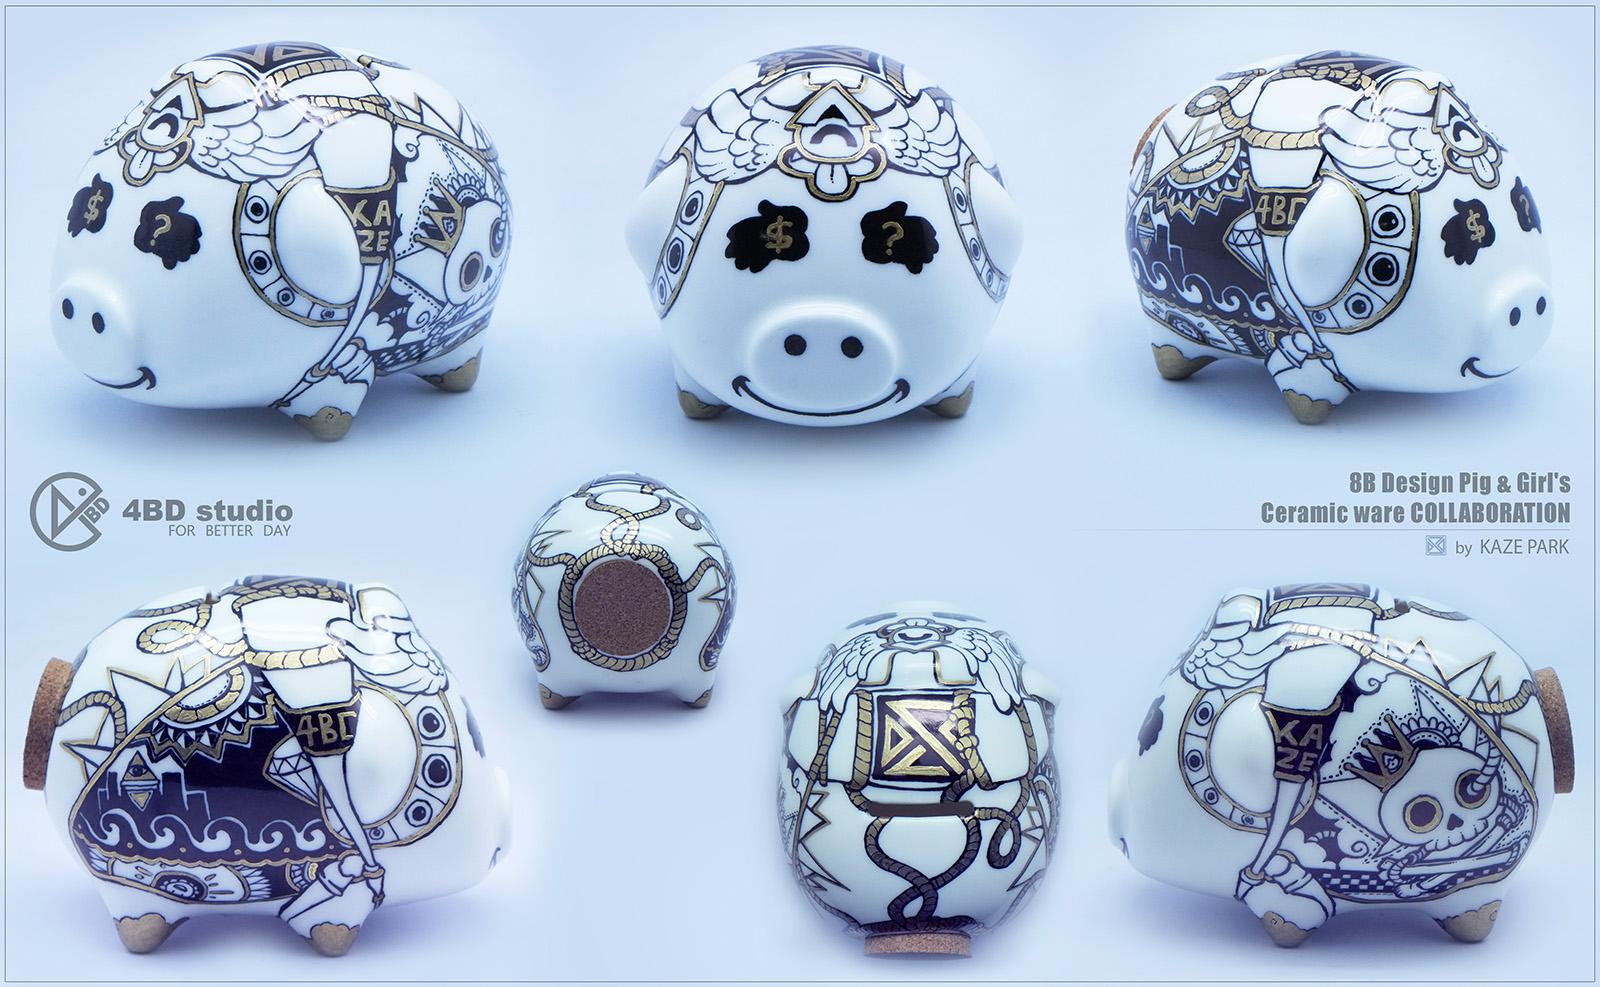 8B Design Pig & Girl's COLLABORATION